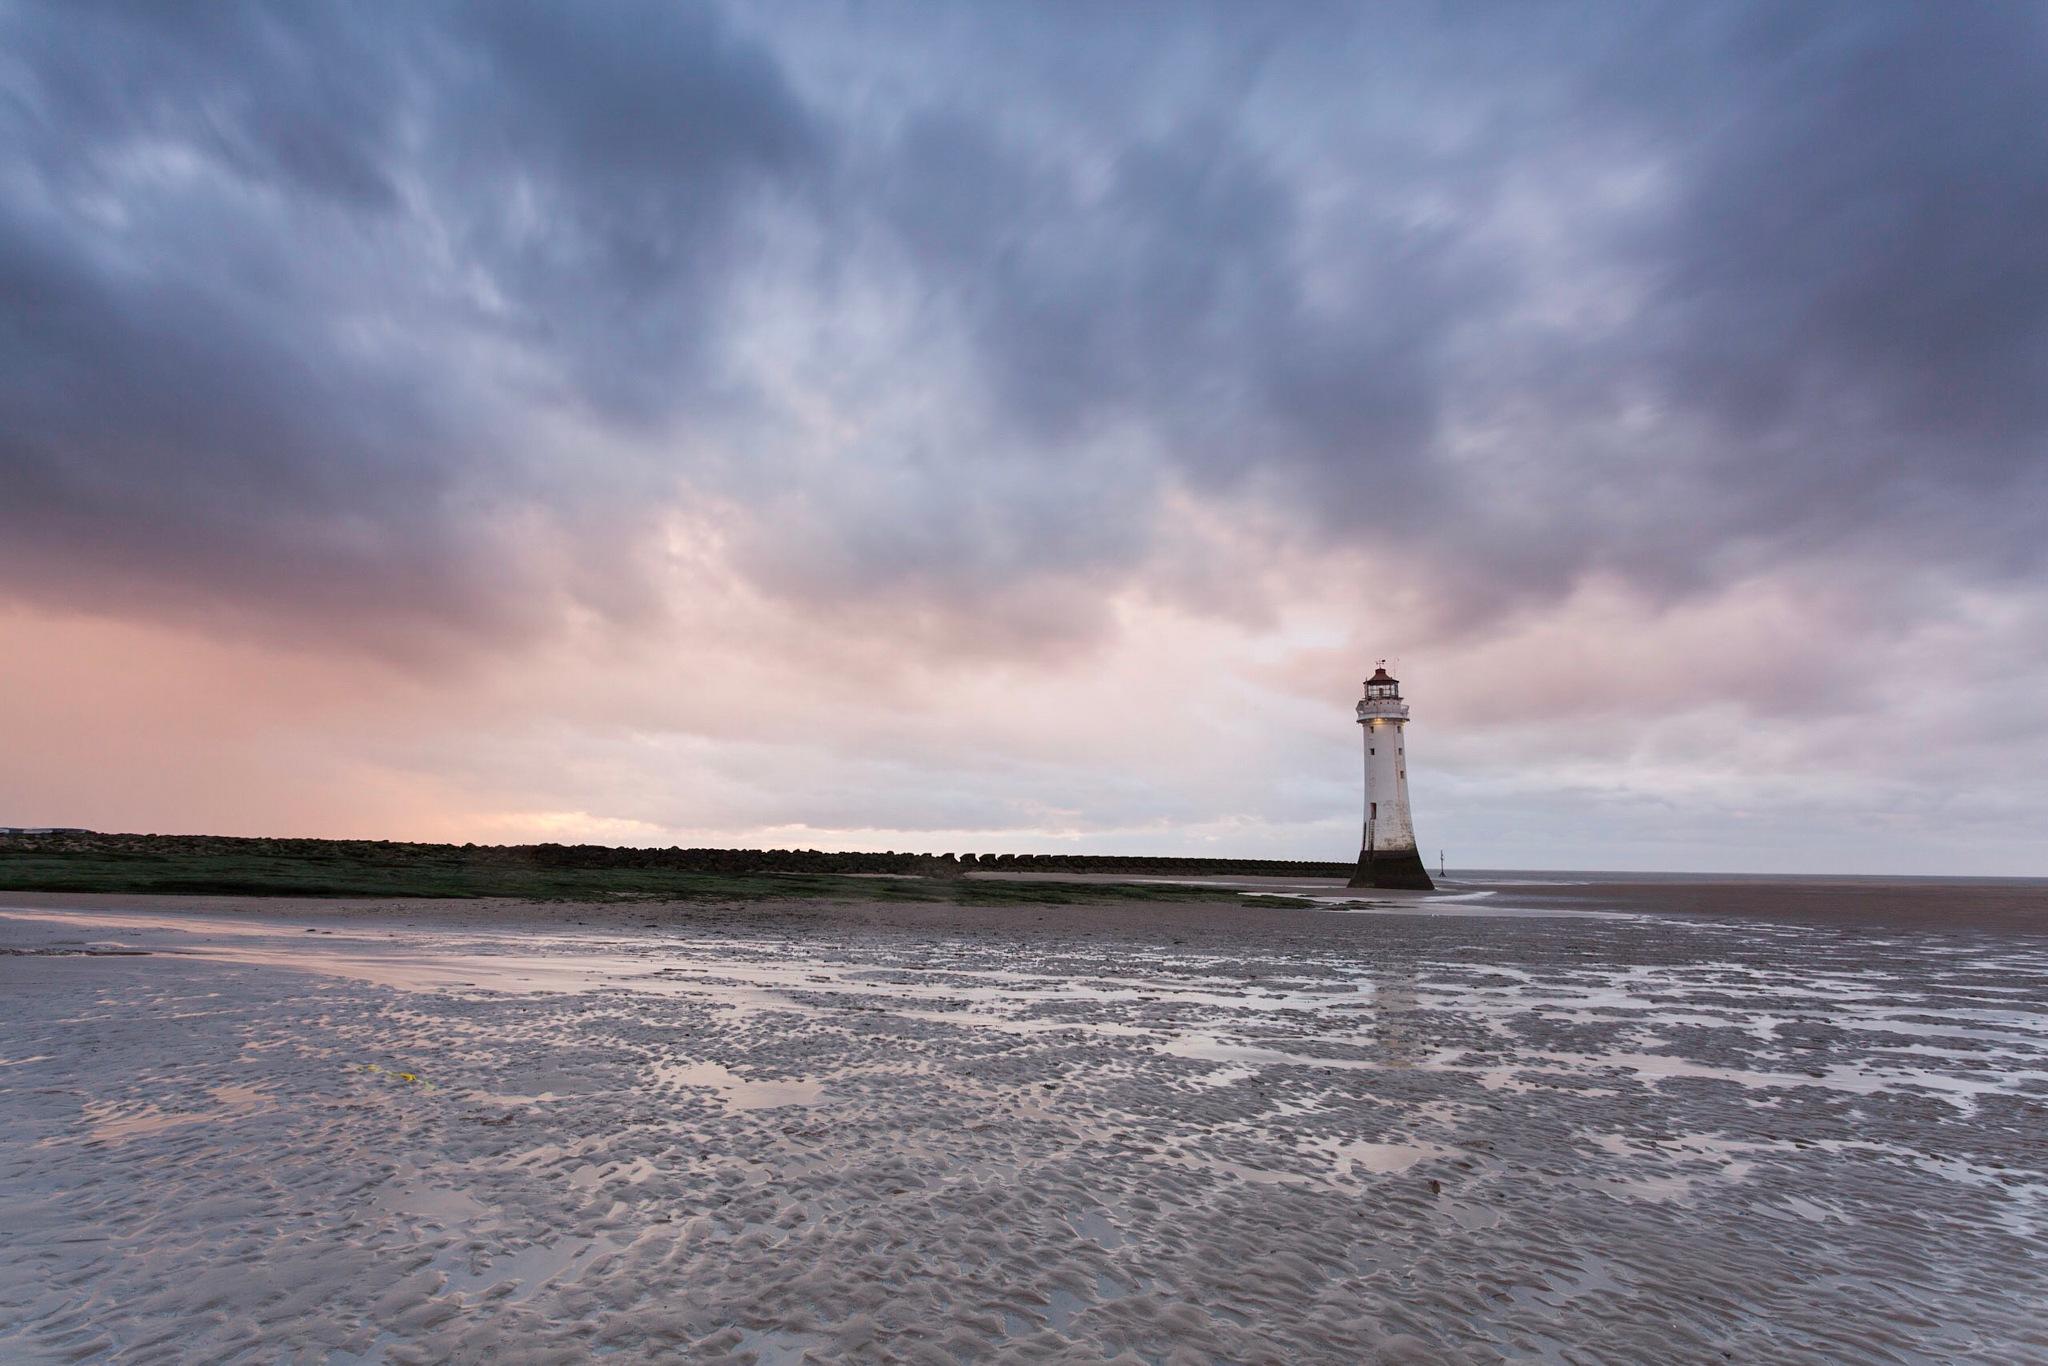 Wet sunset, New Brighton  by Carl Mickleburgh